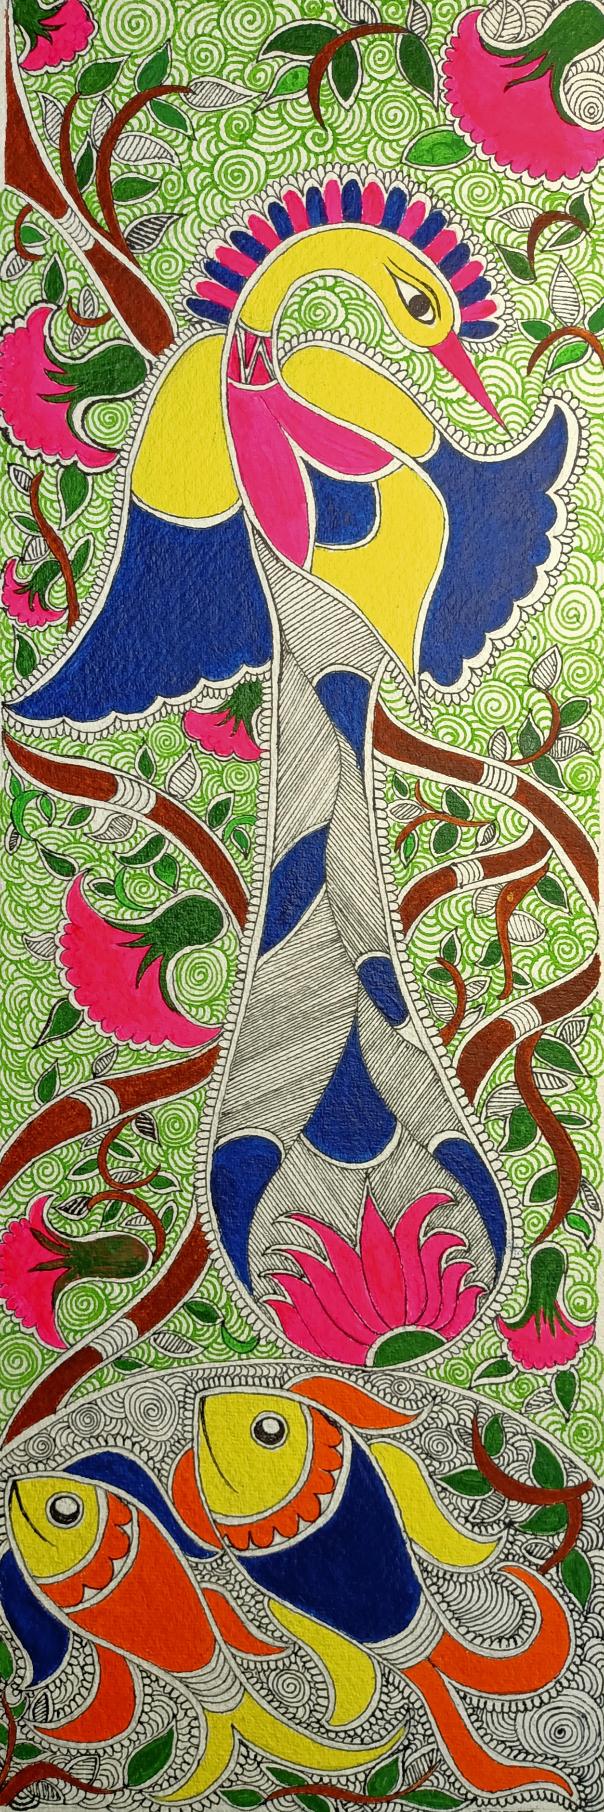 Madhubani Peacock, painting by Ratnamala Indulkar